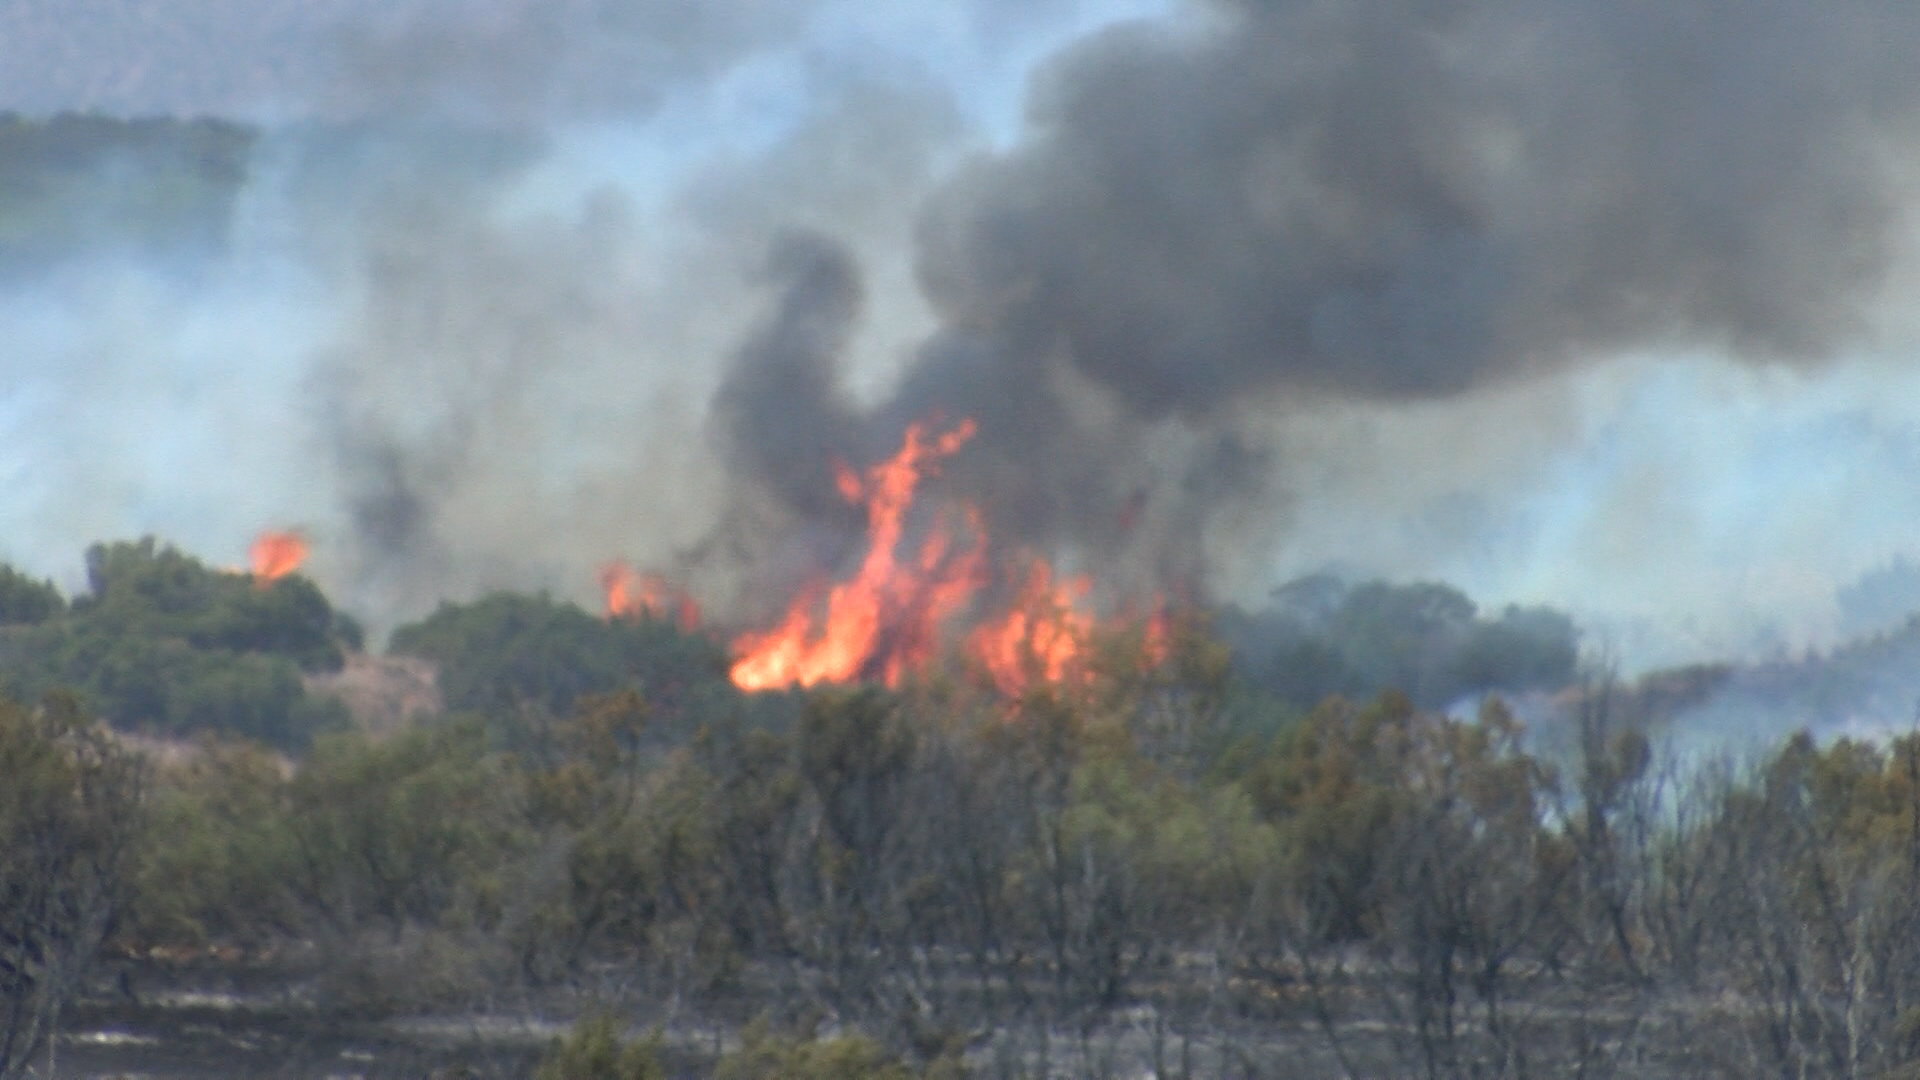 mallard fire walkthrough_1526351294118.jpg.jpg